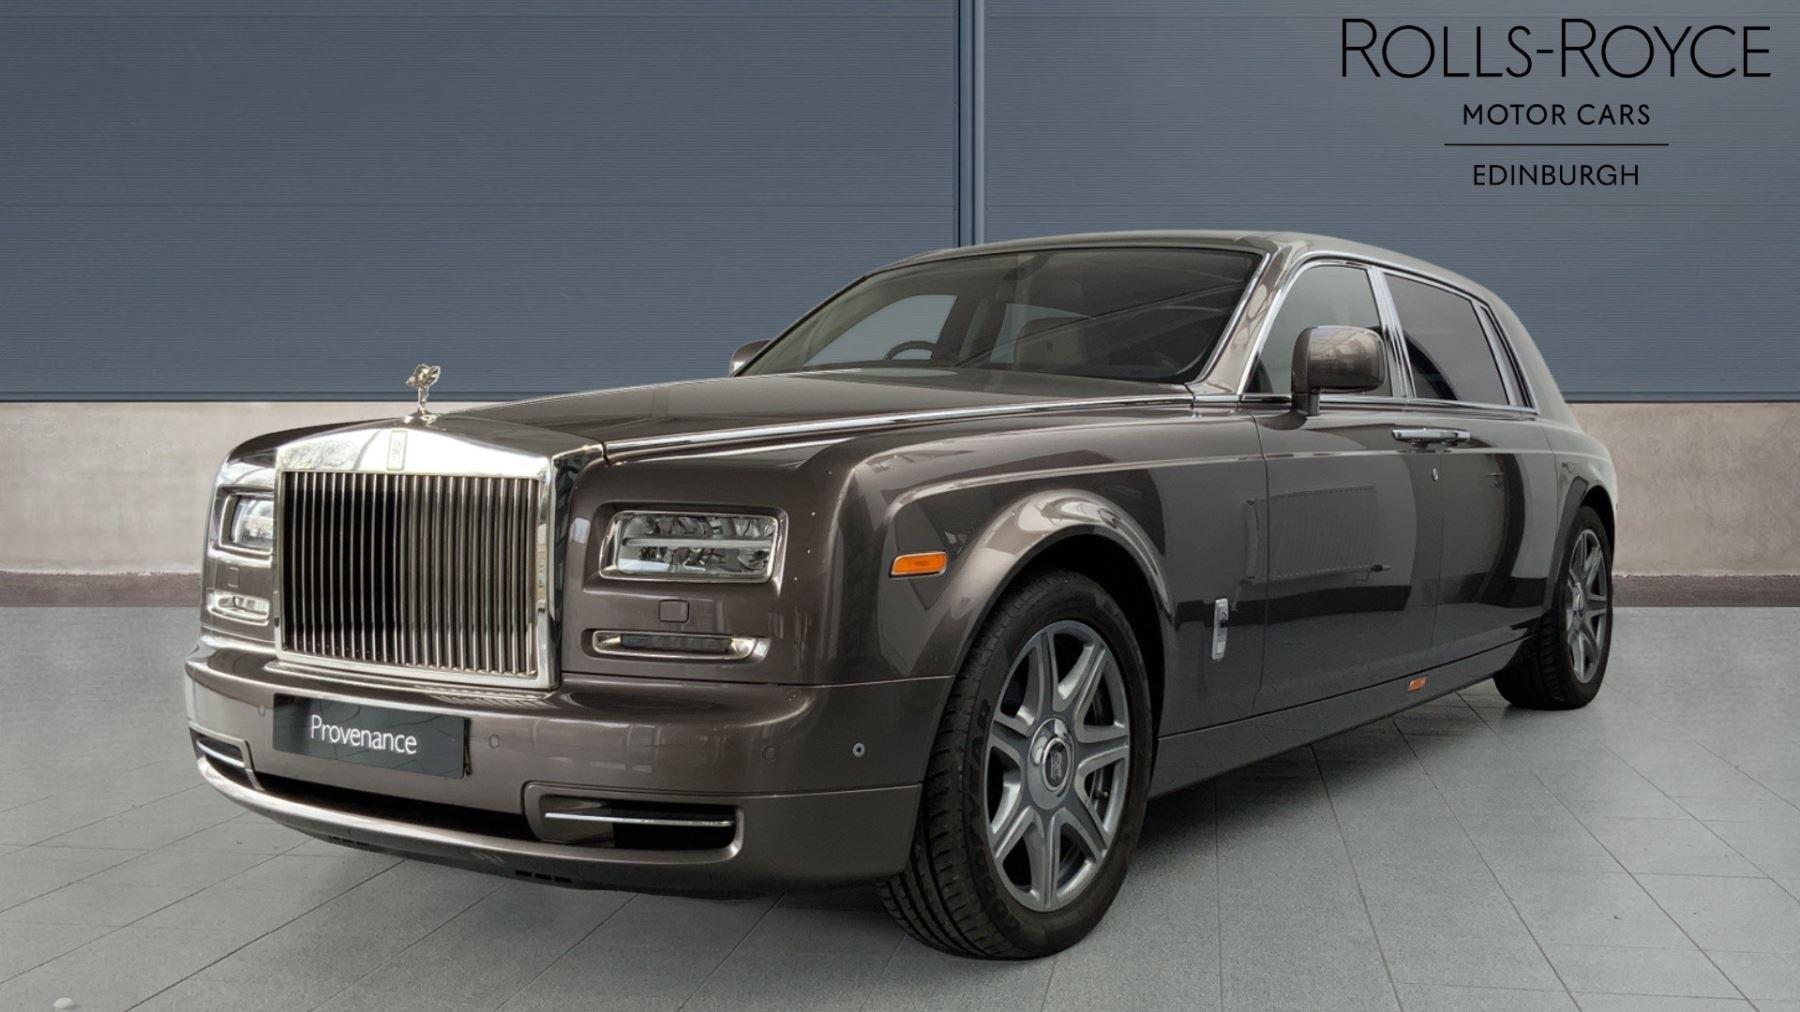 Rolls-Royce Phantom Extended Wheelbase II 4dr Auto Extended Wheel Base 6.7 Automatic Saloon (2014) image